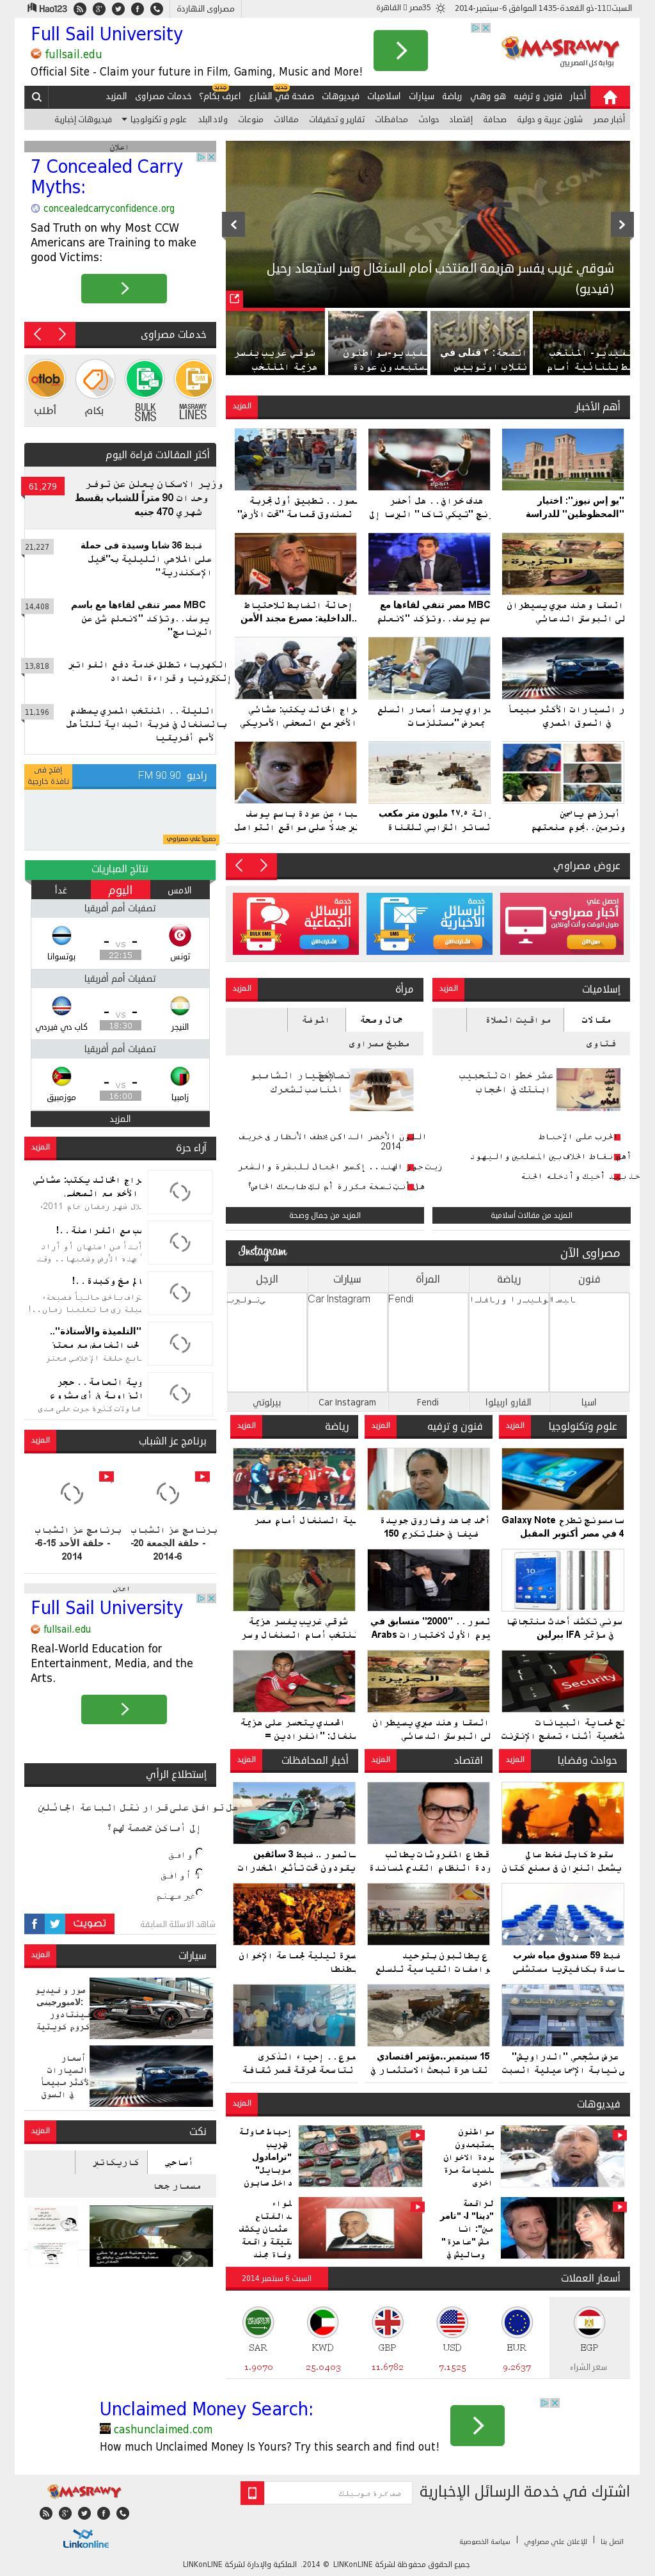 Masrawy at Saturday Sept. 6, 2014, 2:13 a.m. UTC